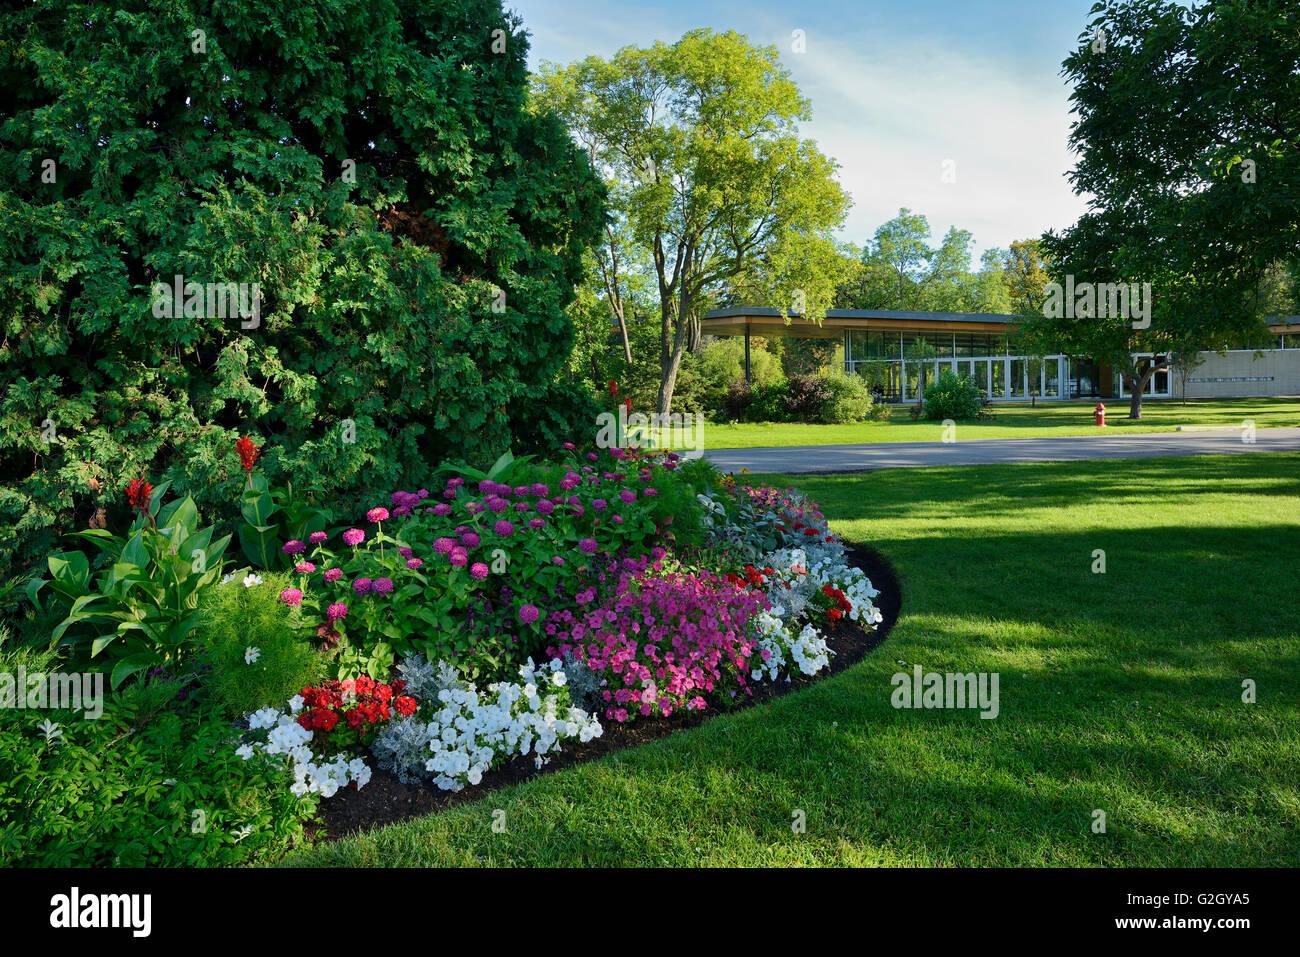 Flower gardens at St. Vital Park Winnipeg Manitoba Canada - Stock Image